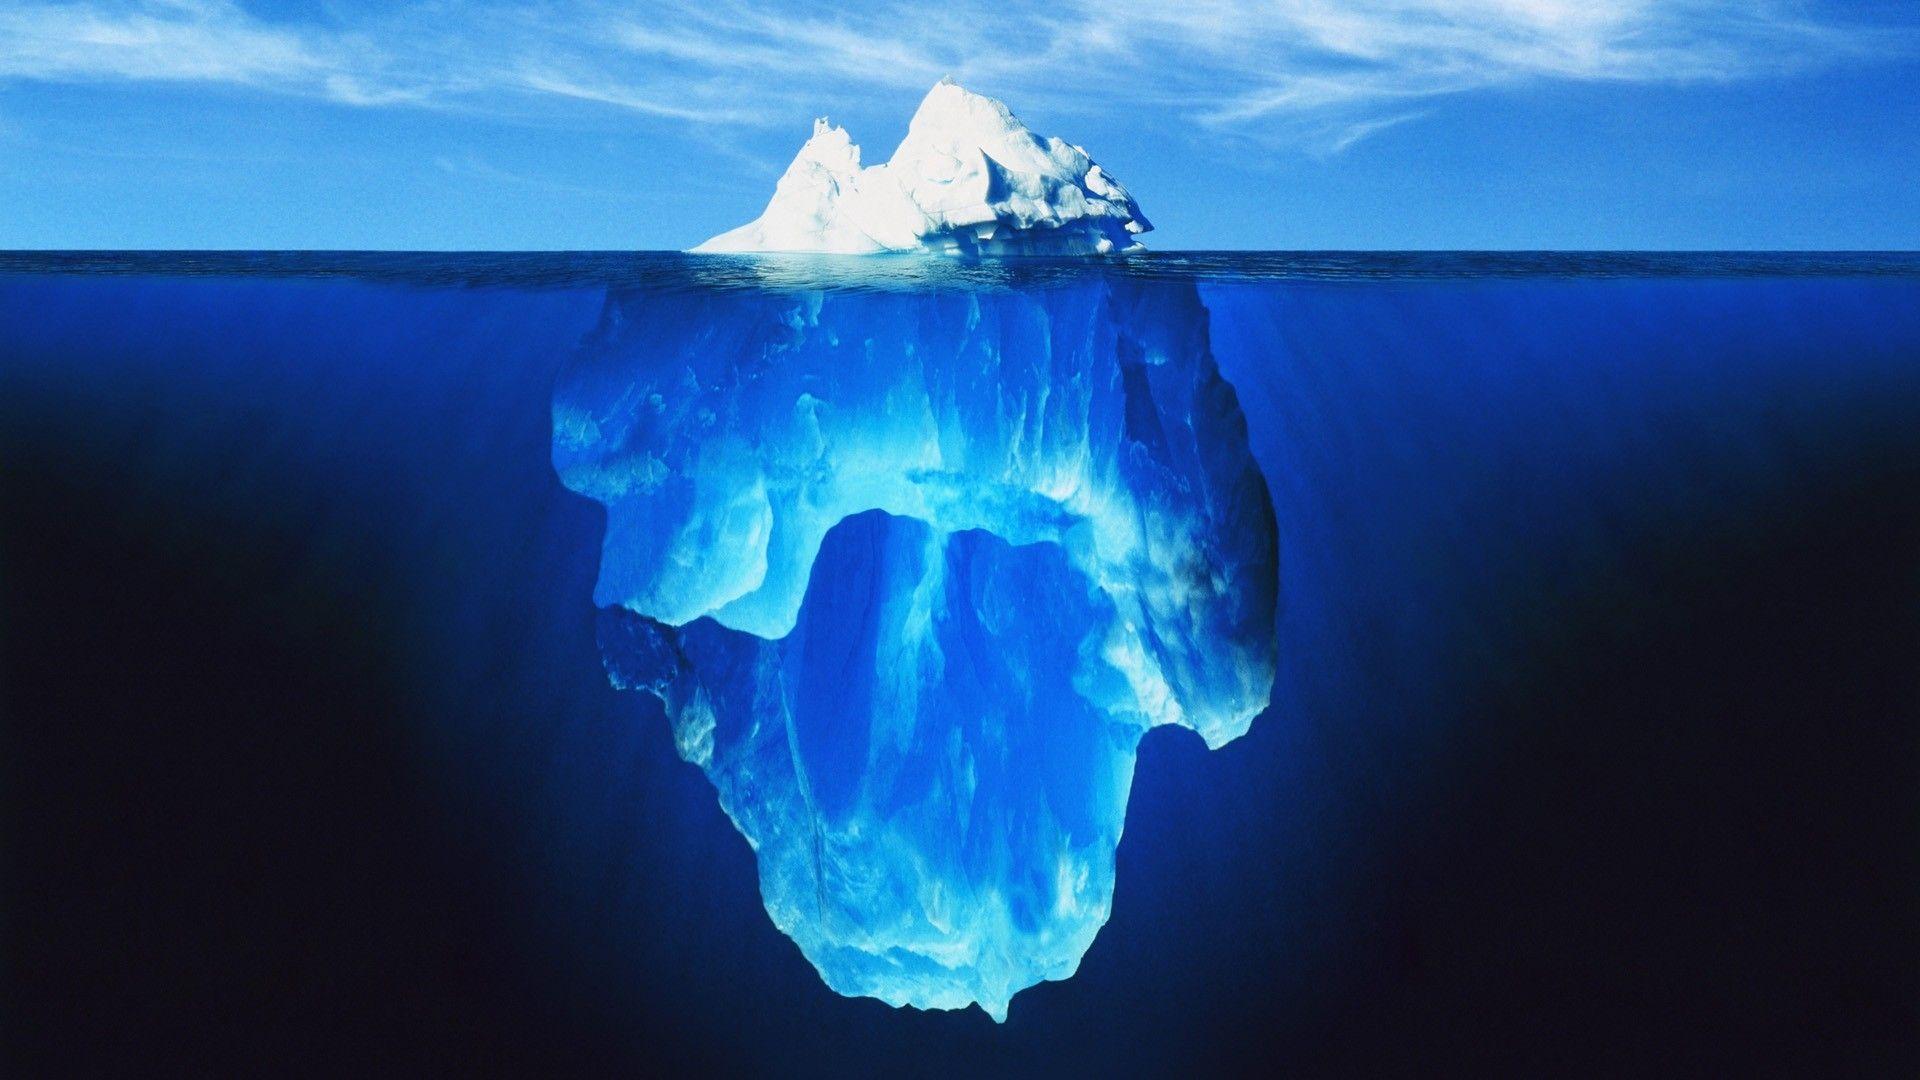 Full HD 1080p Iceberg Wallpapers HD, Desktop Backgrounds